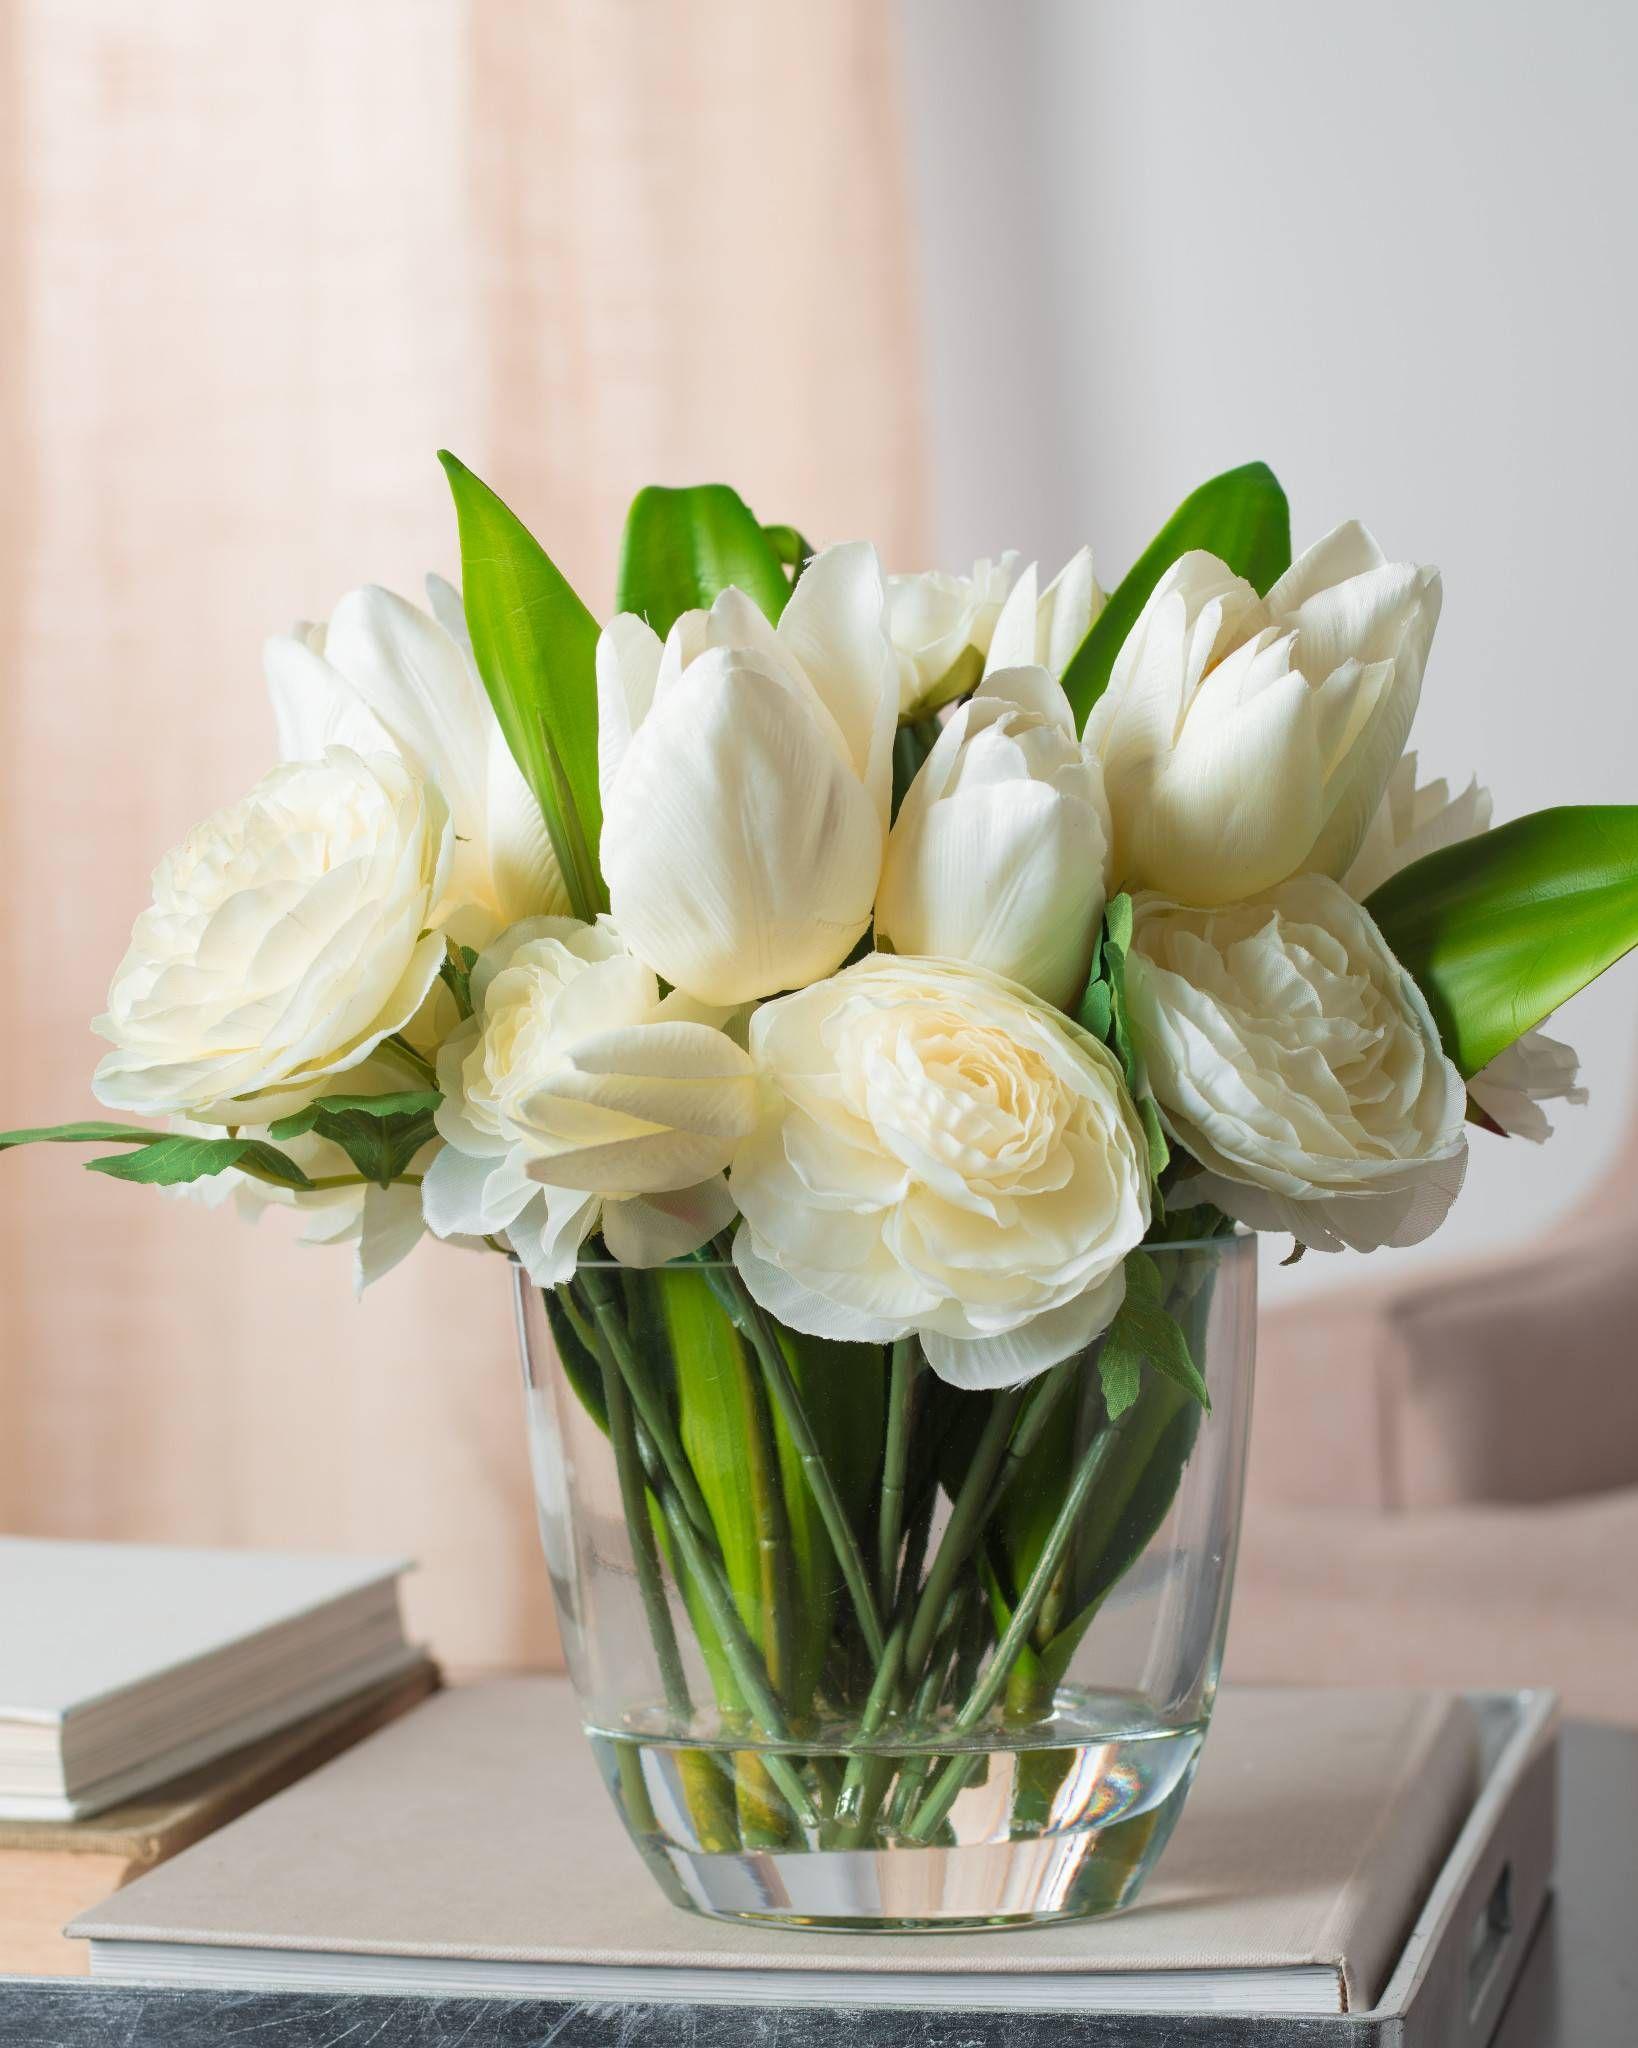 Tulip Ranunculus Flower Arrangement A Gathering Of Beautiful White Flo Flower Vase Arrangements Artificial Flower Arrangements Flower Arrangements Simple